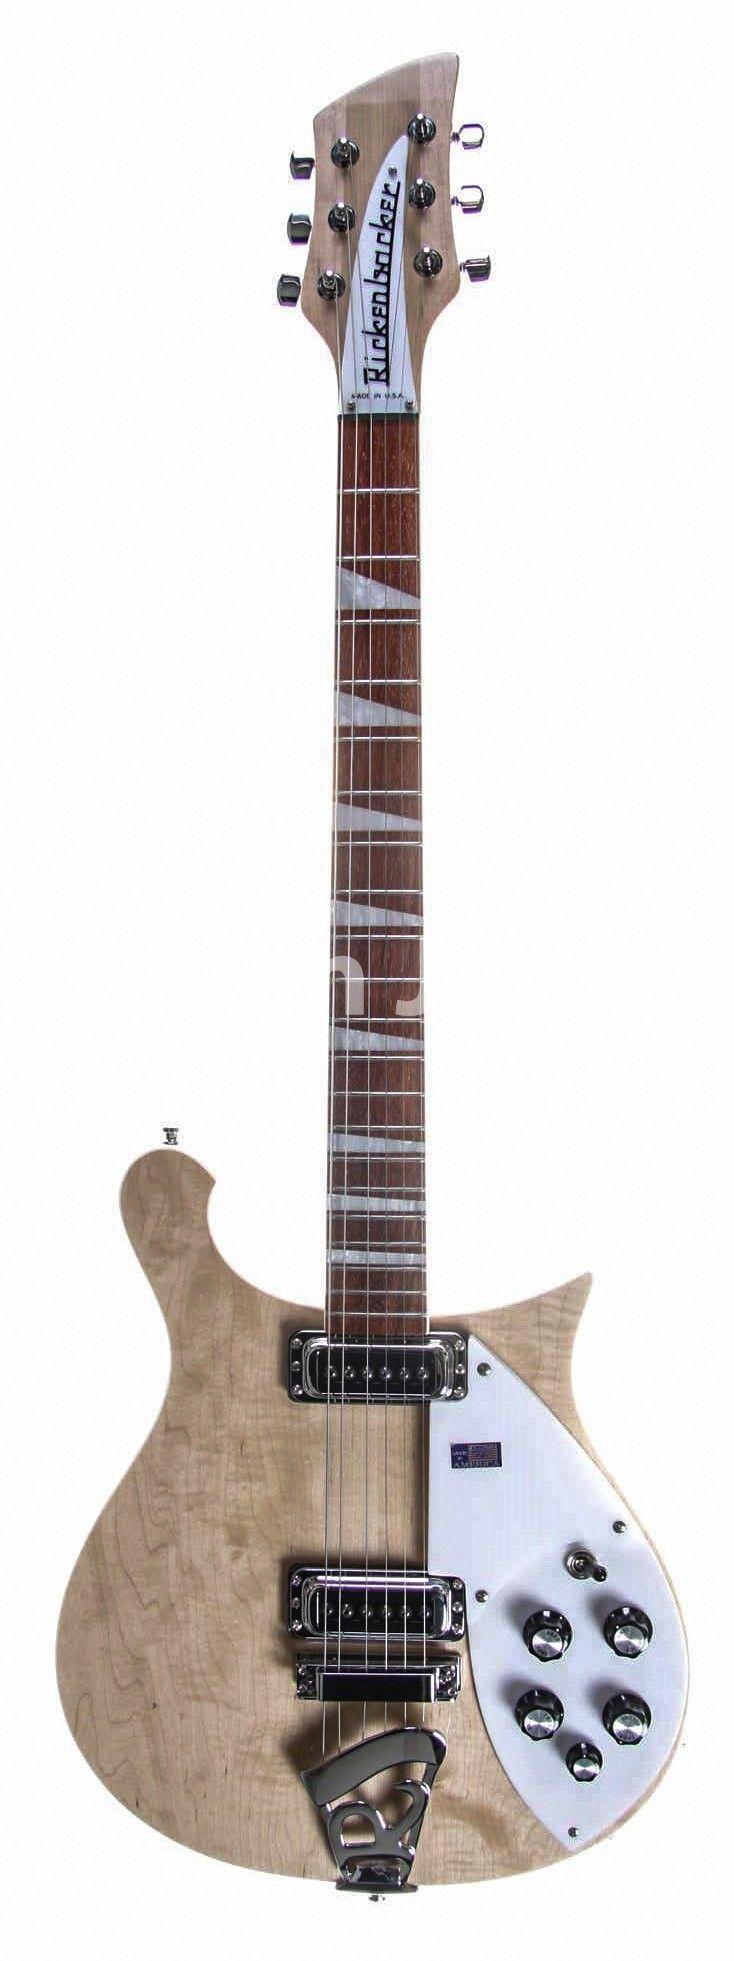 Rickenbacker 620 Electric Guitar Mapleglo